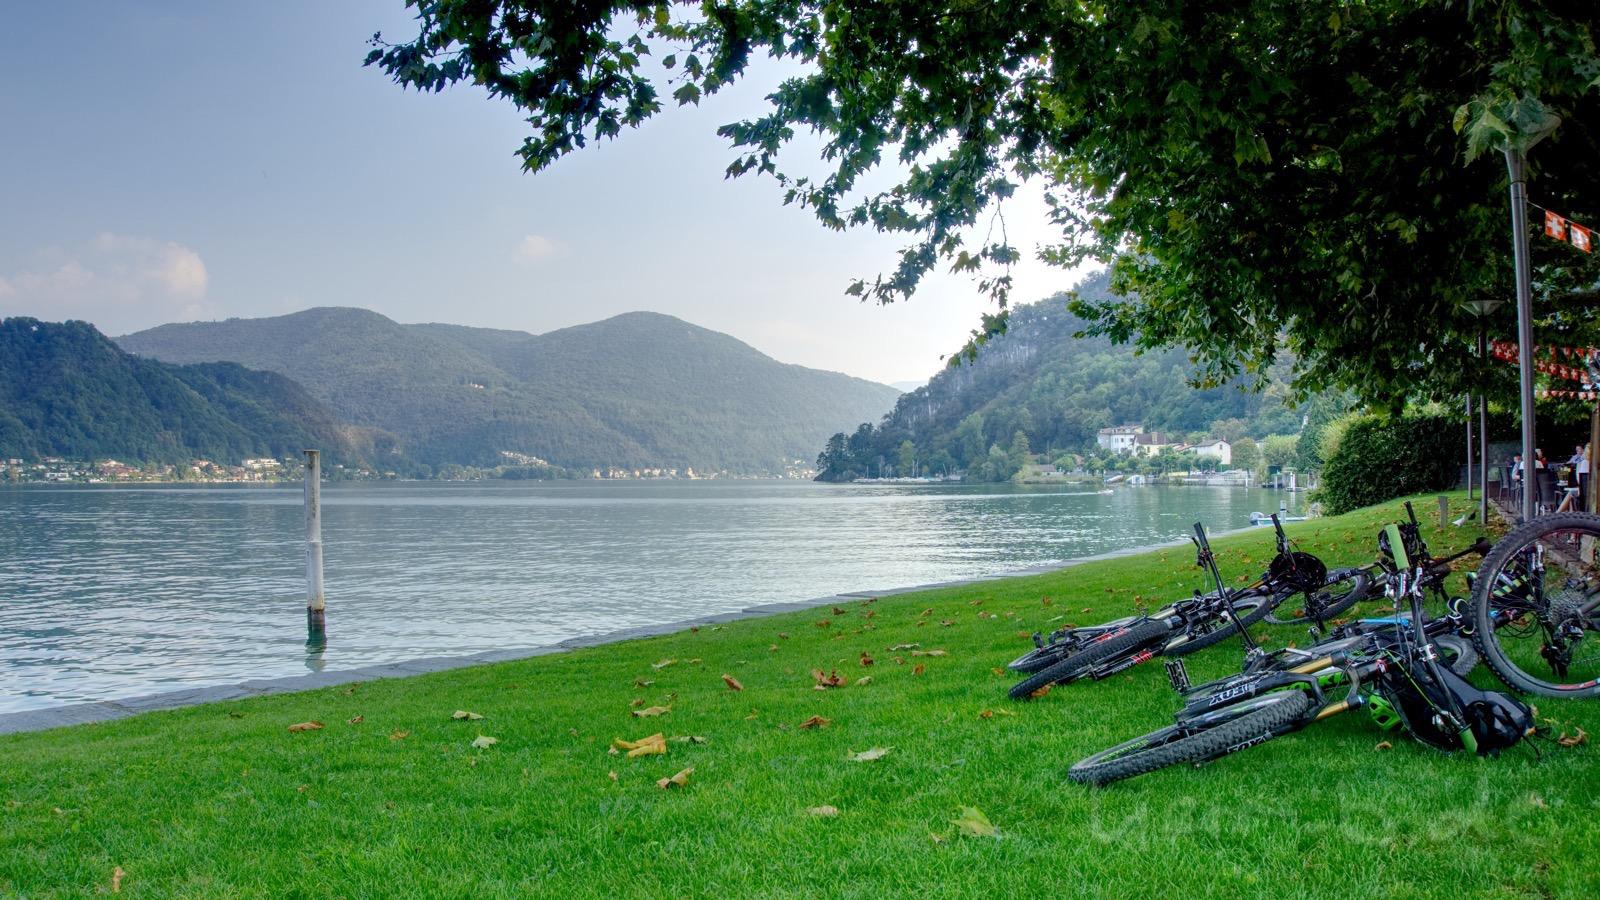 Angekommen in Caslano am Lago di Lugano.